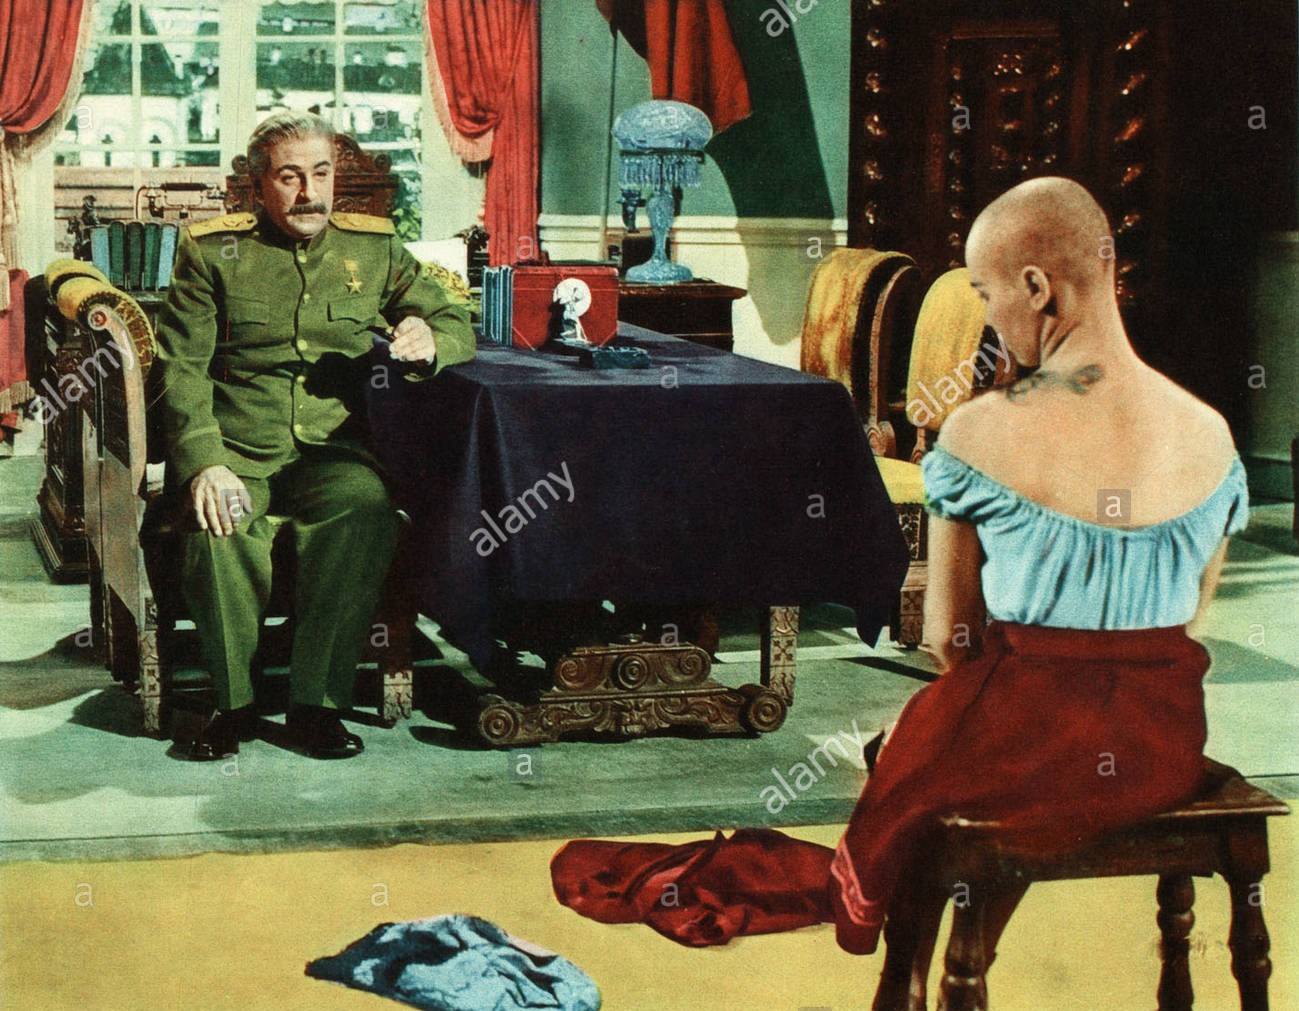 the-girl-in-the-kremlin-the-girl-in-the-kremlin-1957-usa-maurice-manson-B83AYR.jpg